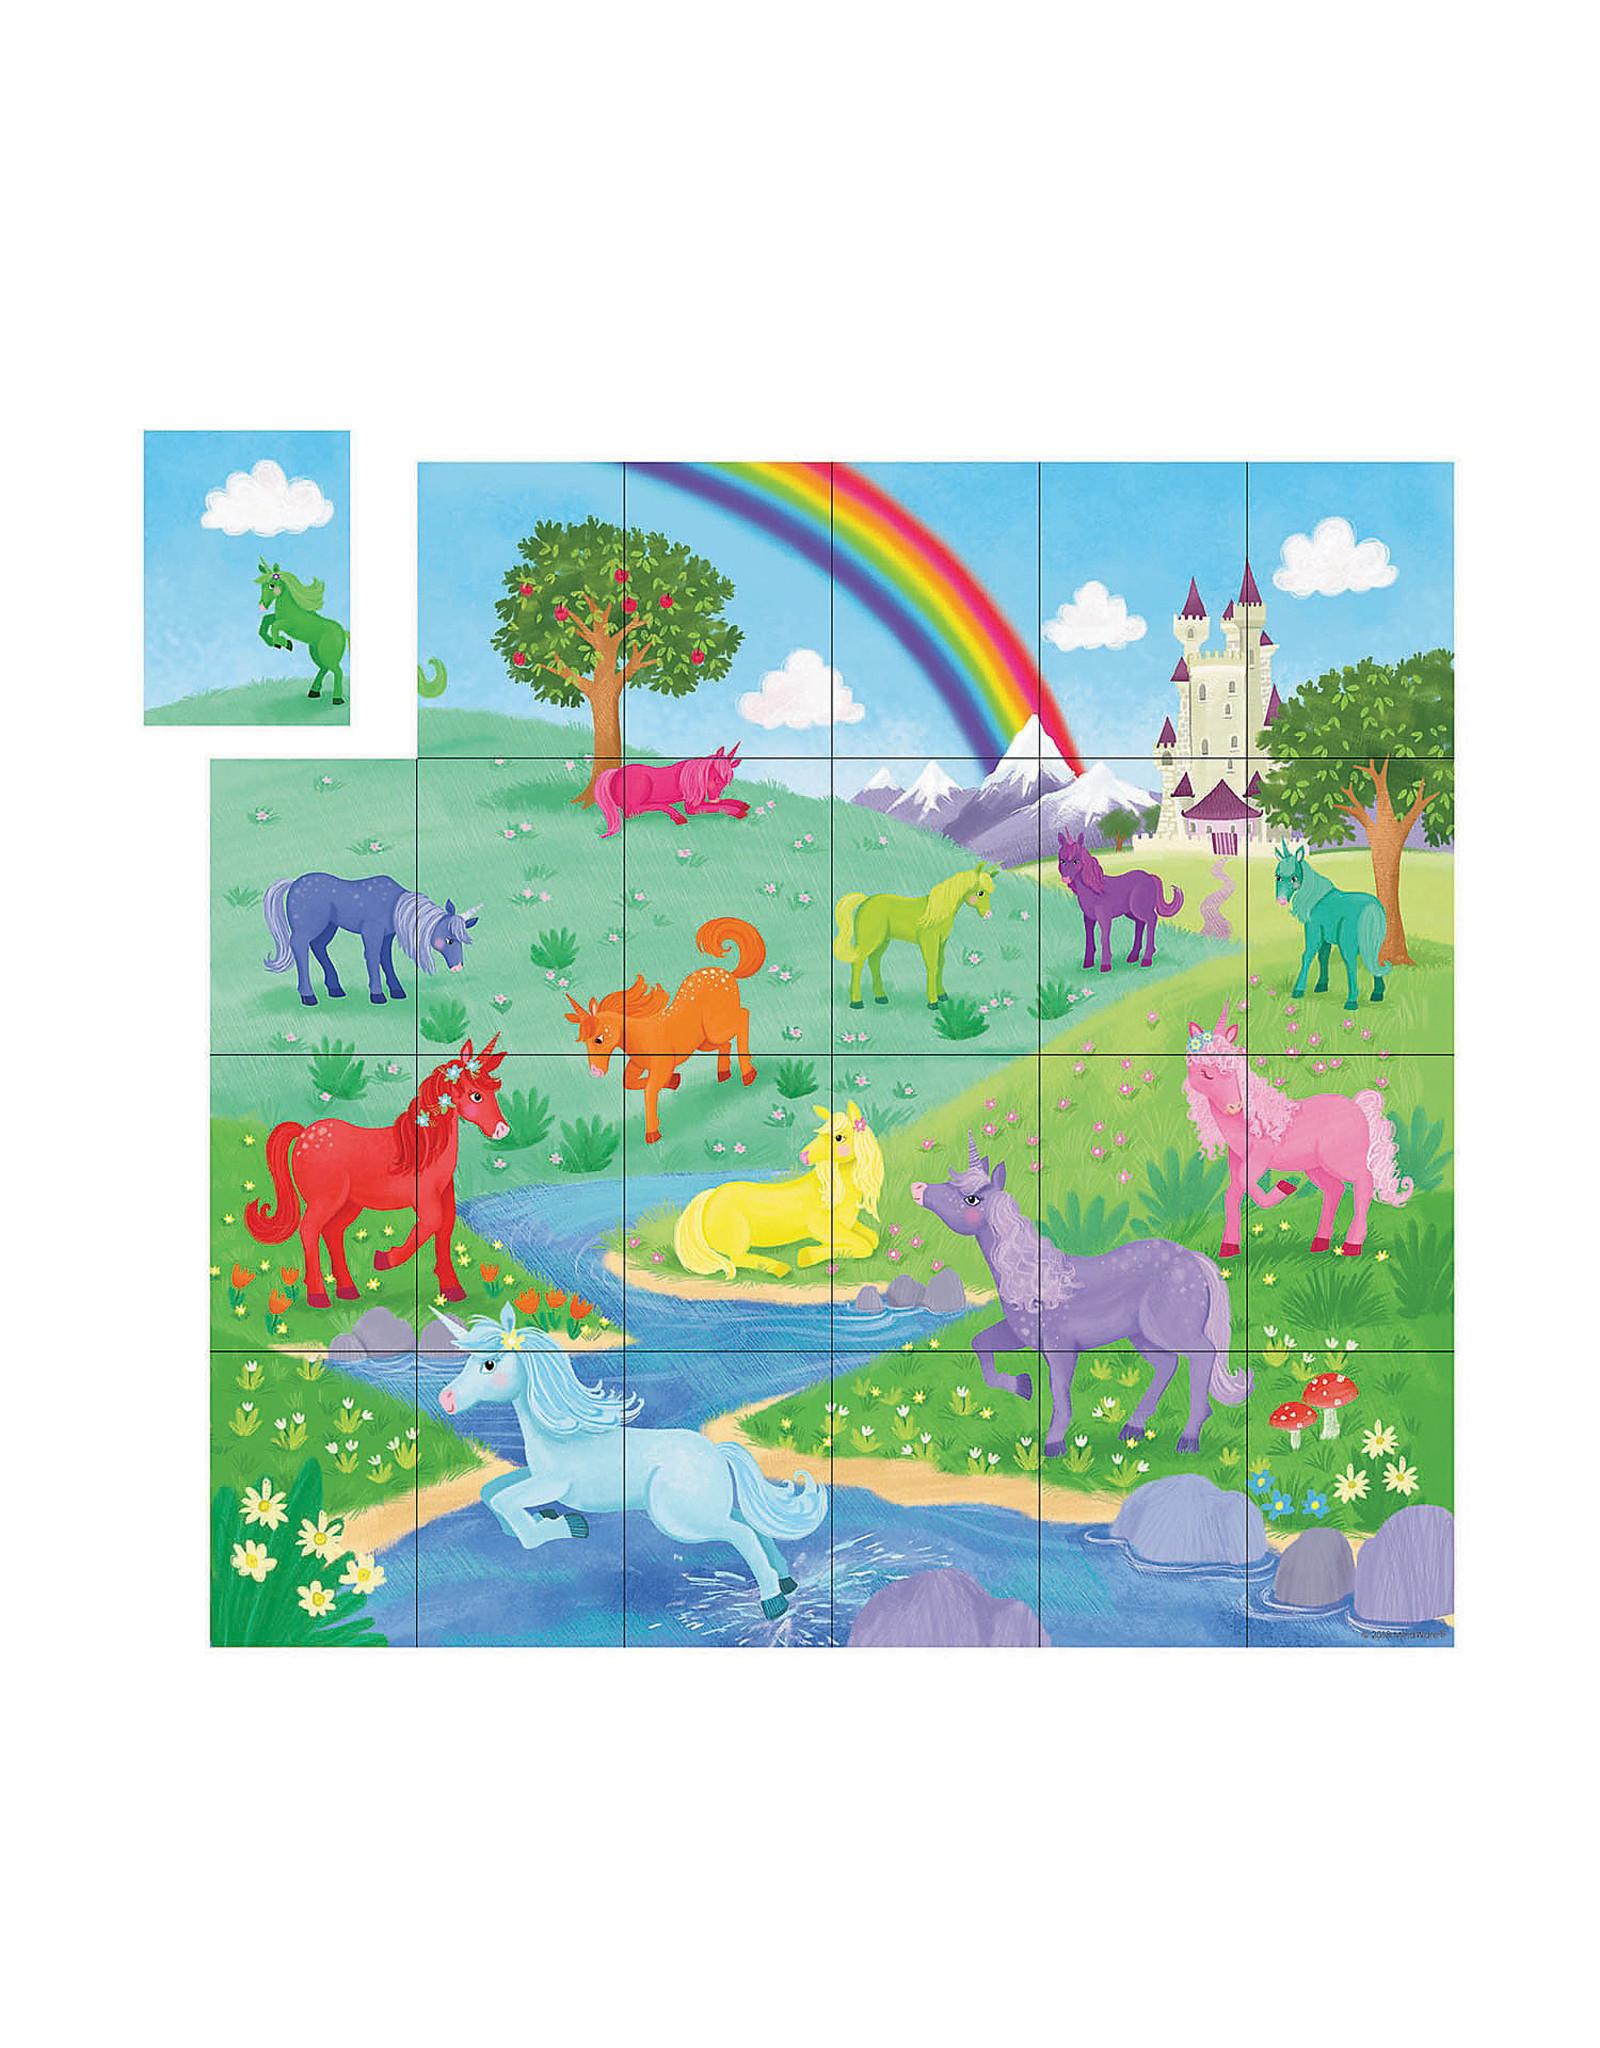 Peaceable Kingdom Match Up Games & Puzzles